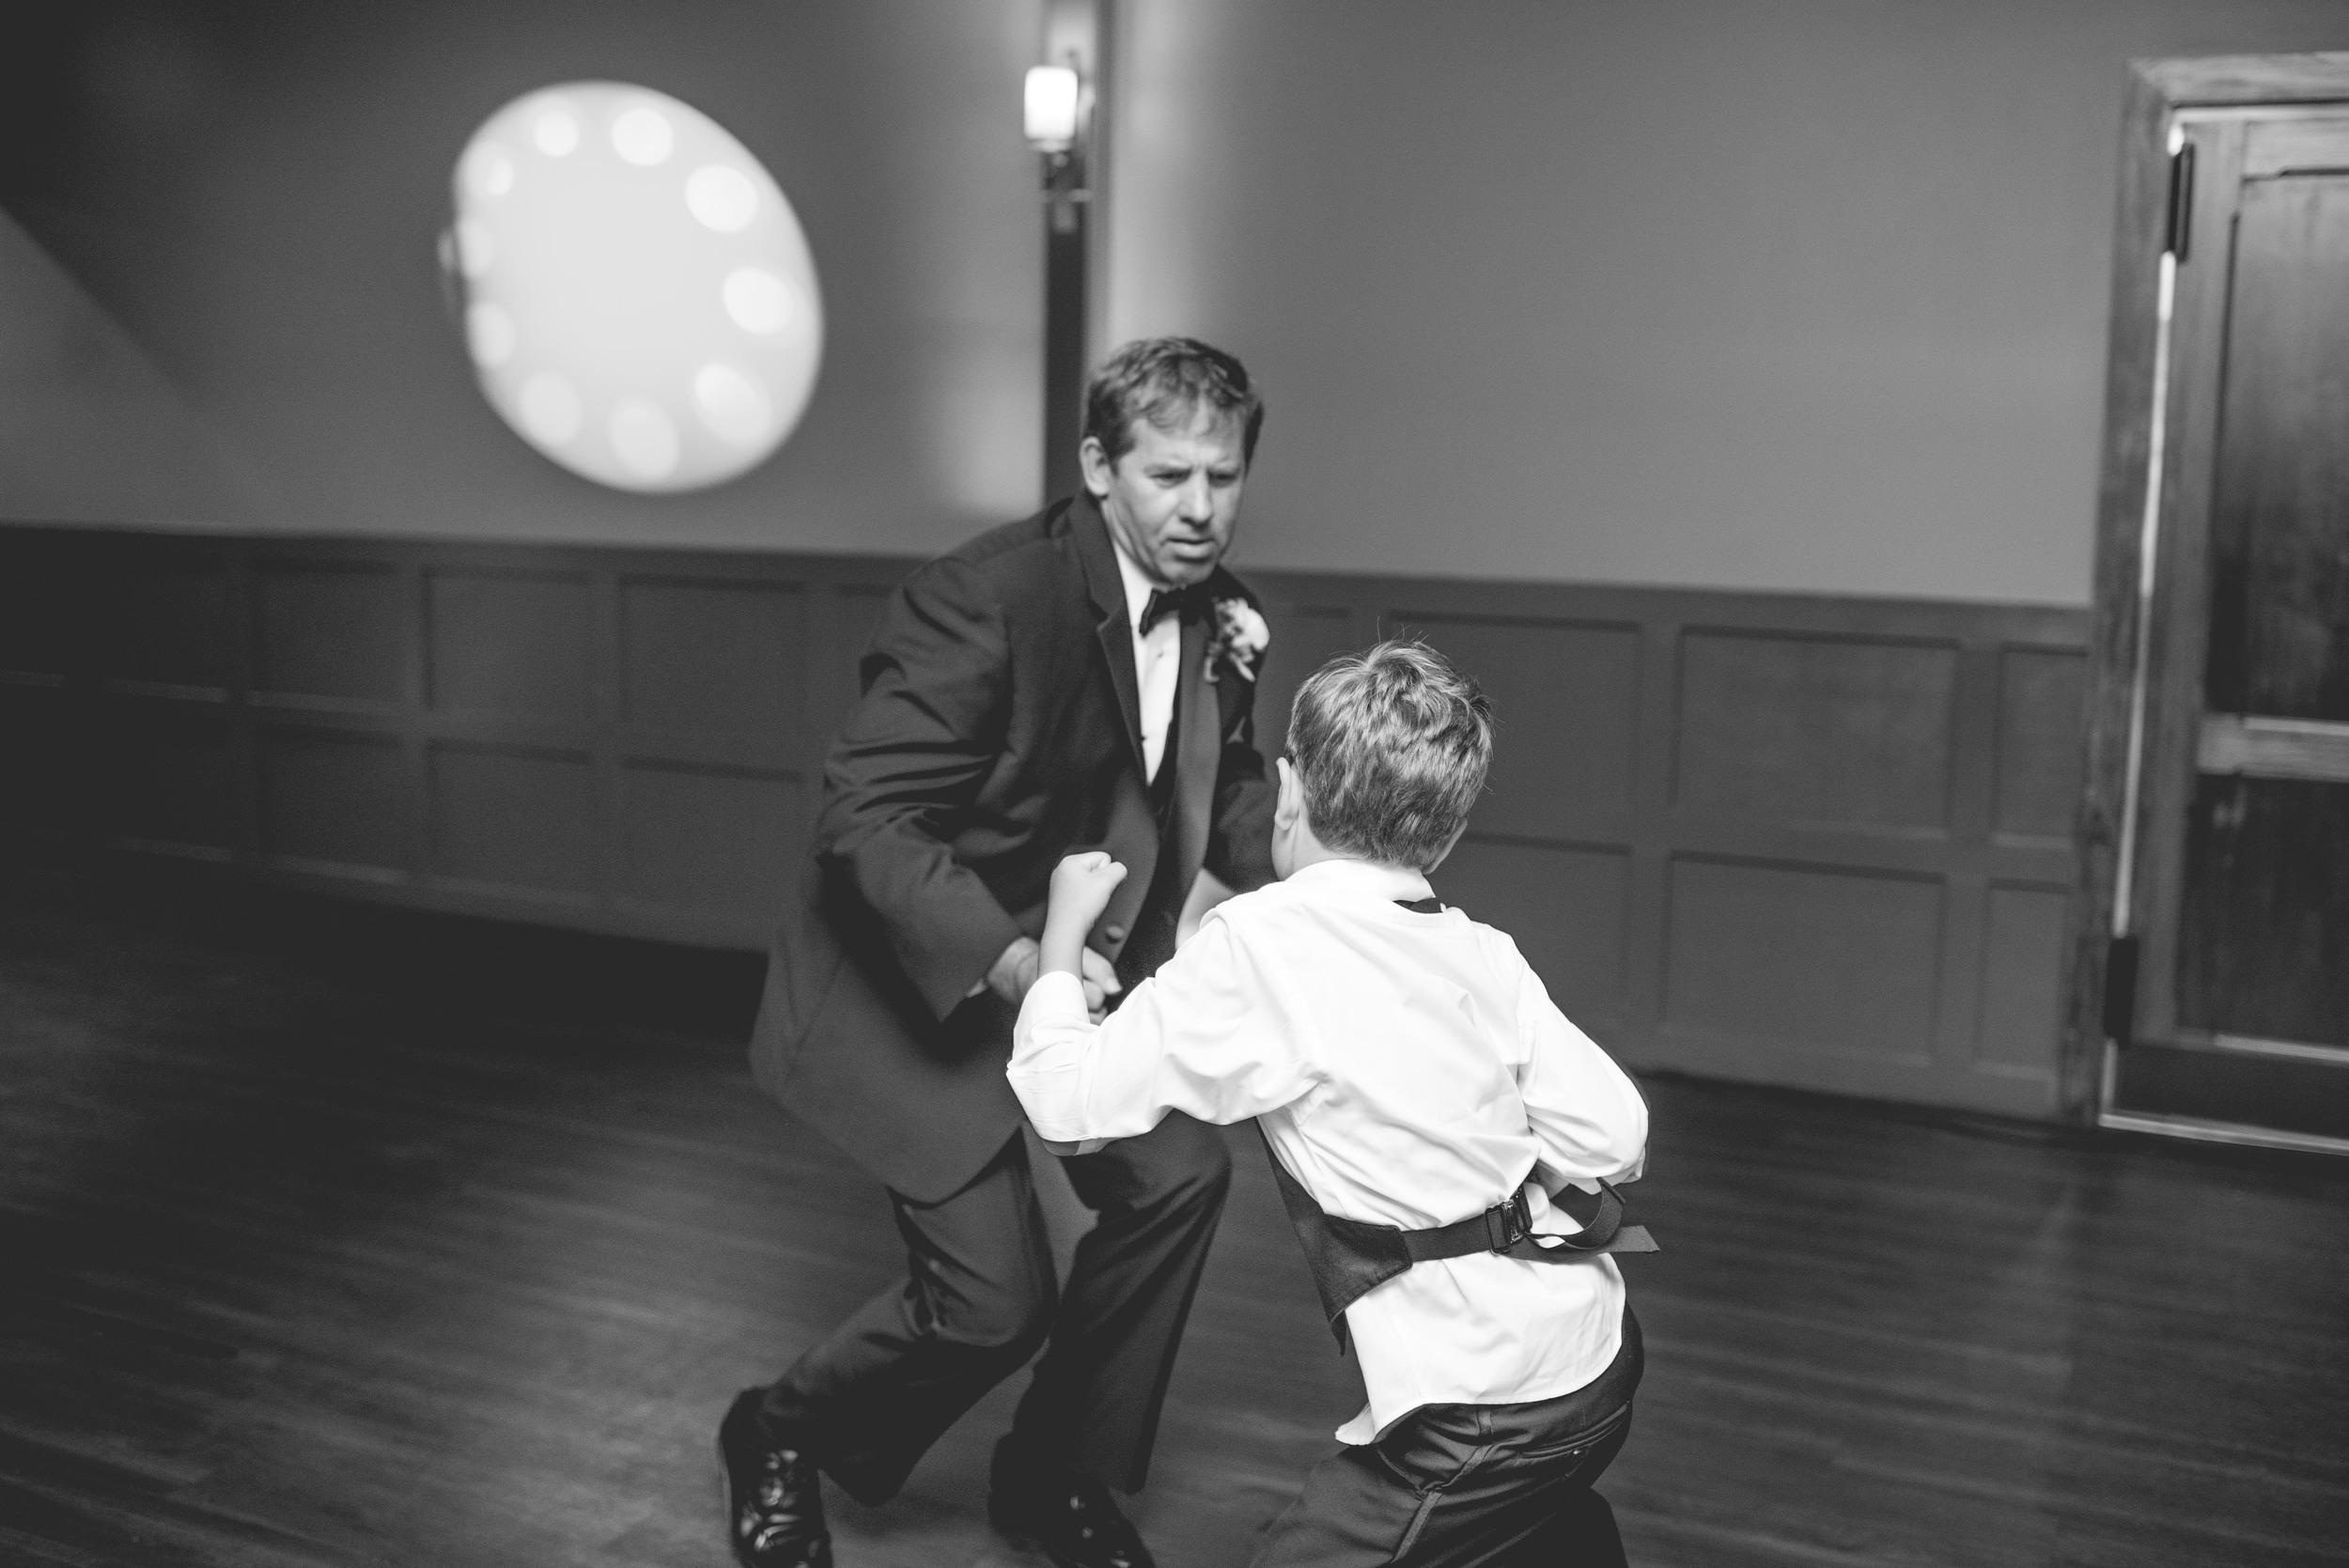 sarasutterphotography_leeandshalon_wedding_2015-736.jpg